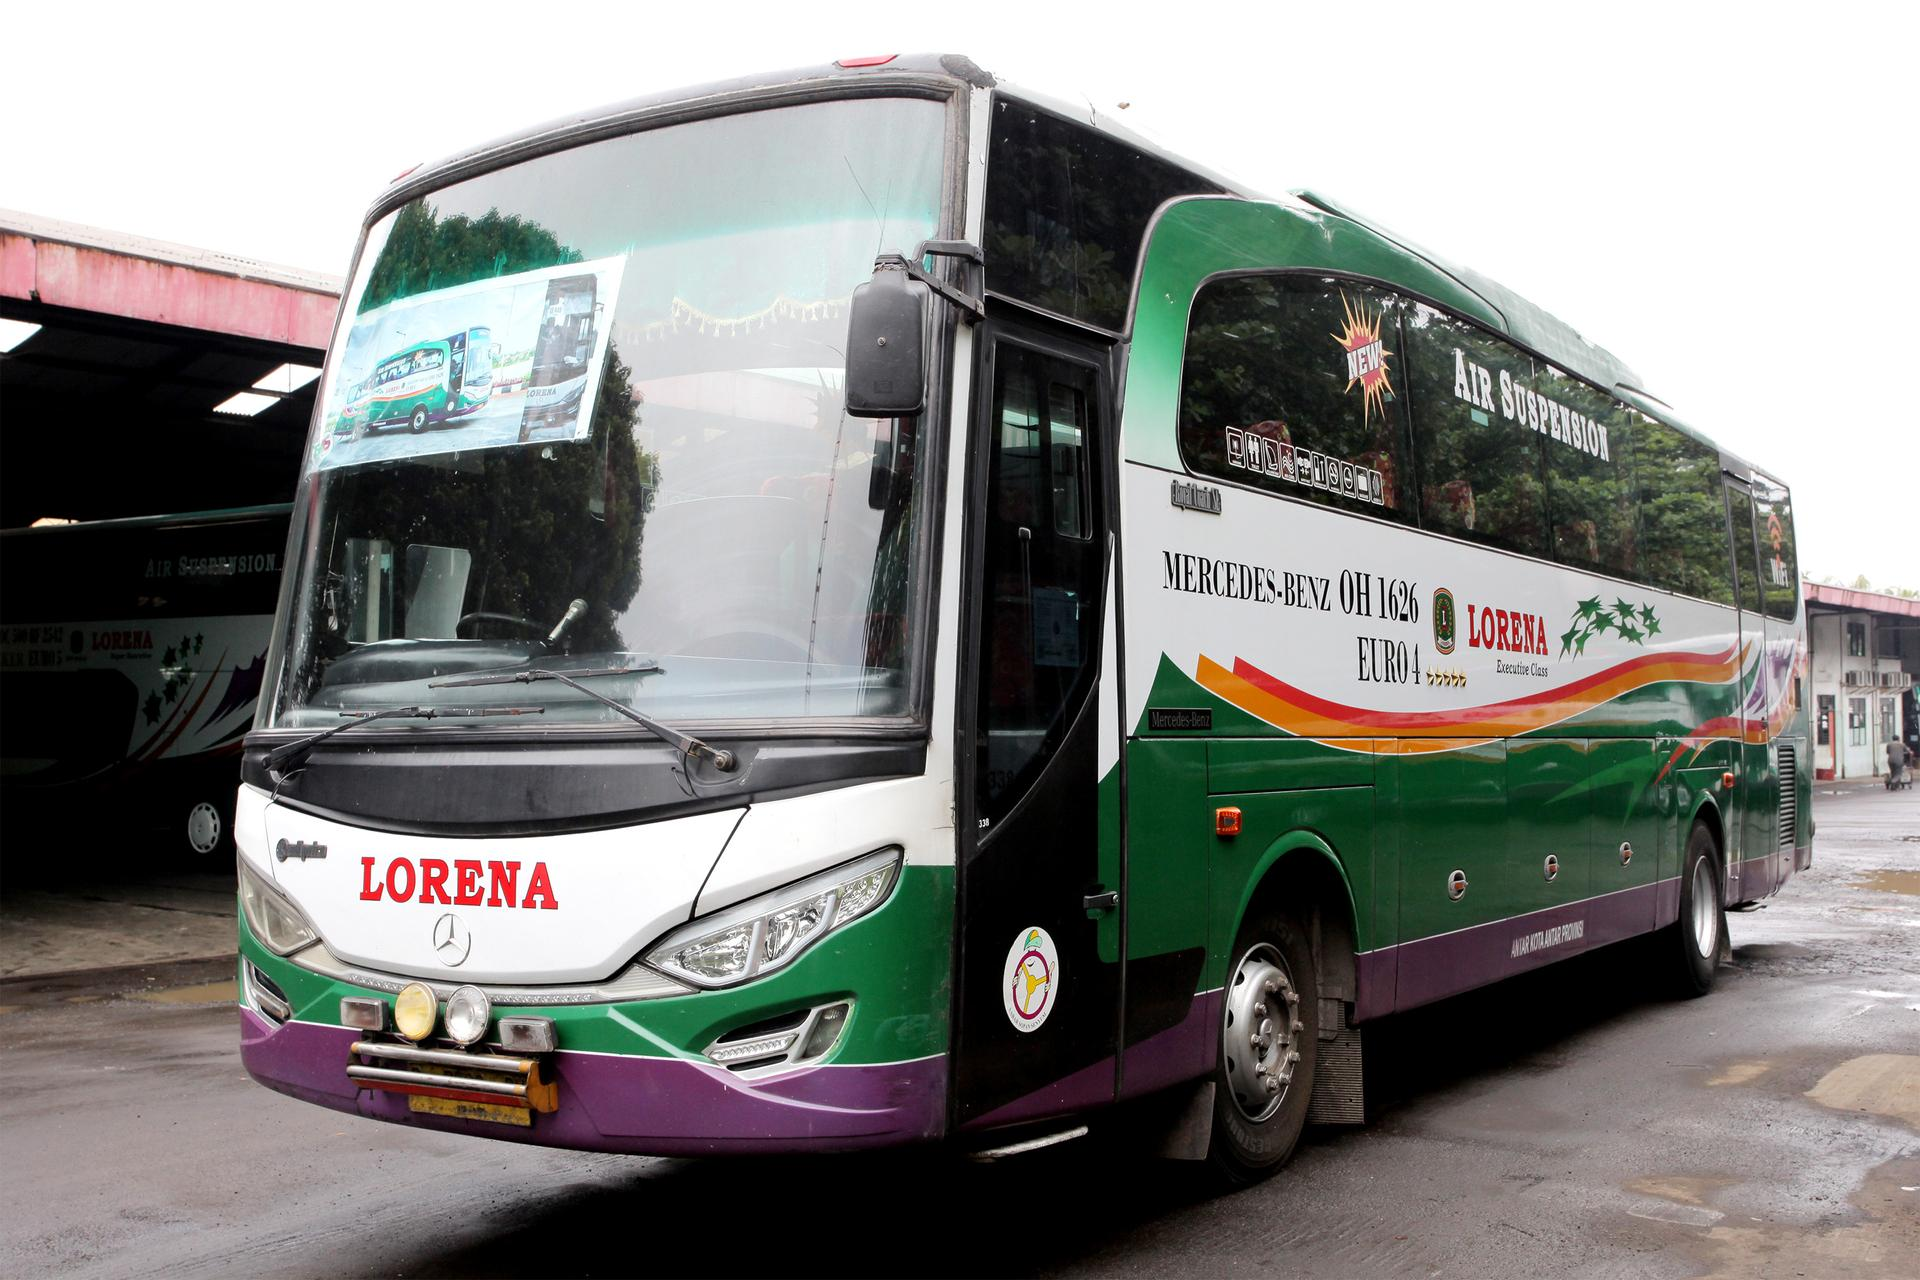 Lorena Book Lorena Bus Ticket At Traveloka